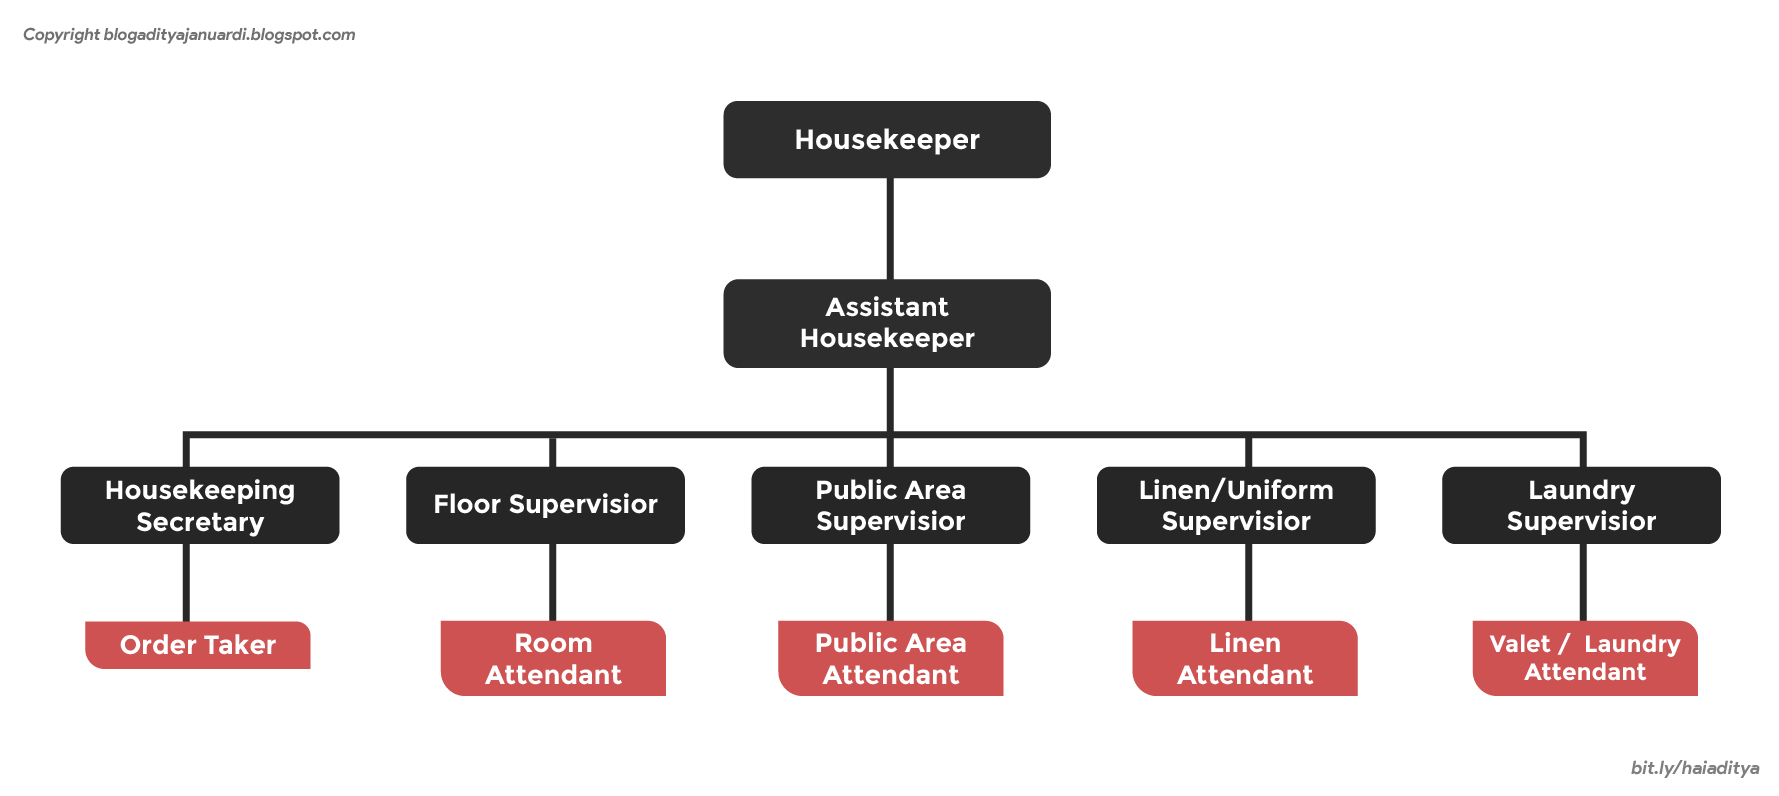 Struktur Organisasi Housekeeping Department beserta Tugas dan Tanggung Jawab masing-masing Bagian